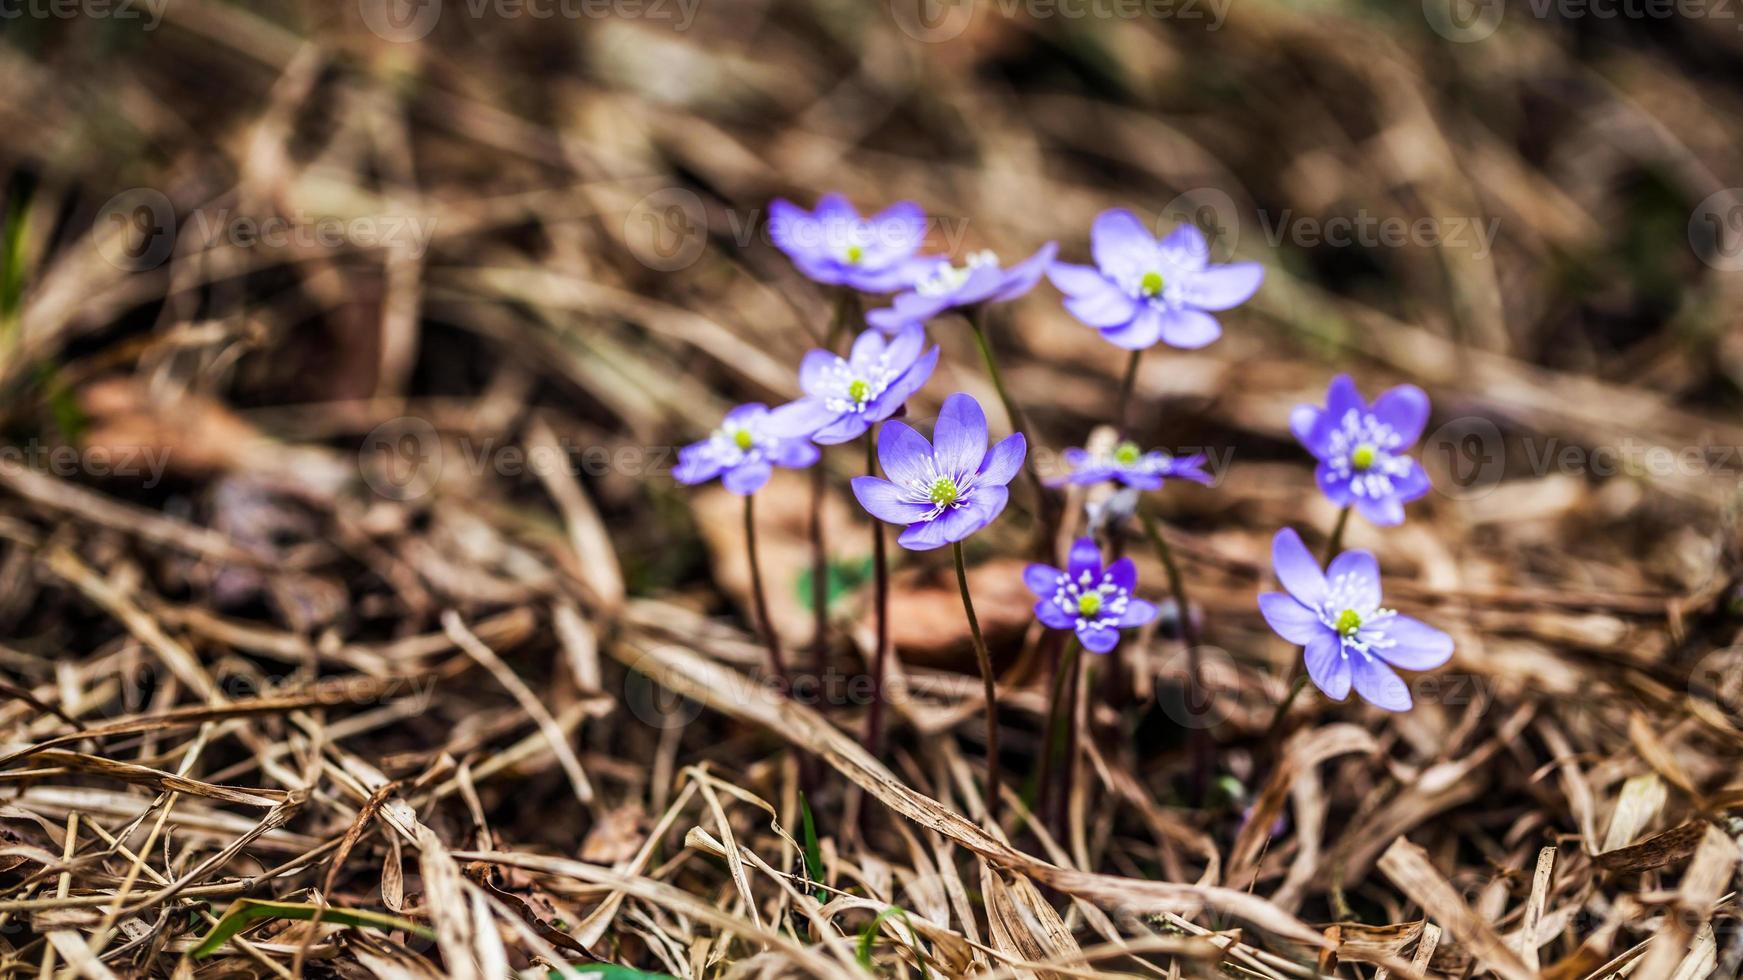 flor de hepática foto